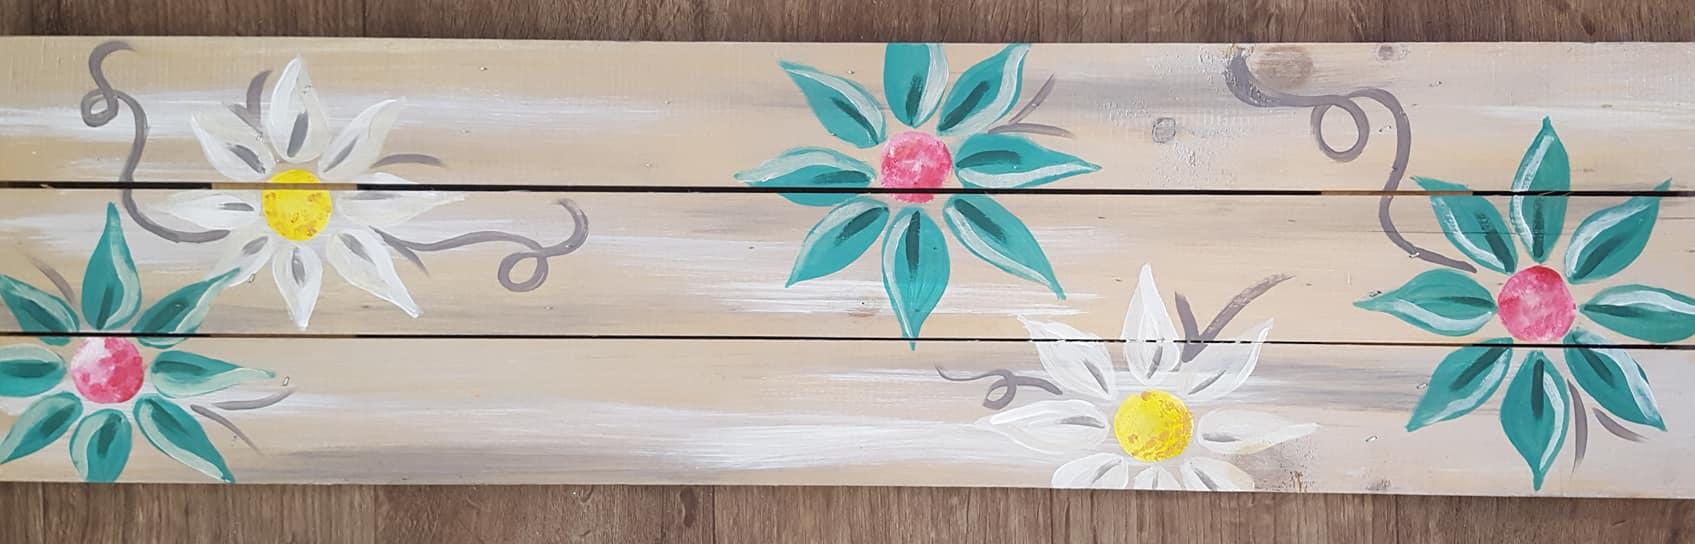 Flower Pallet $25